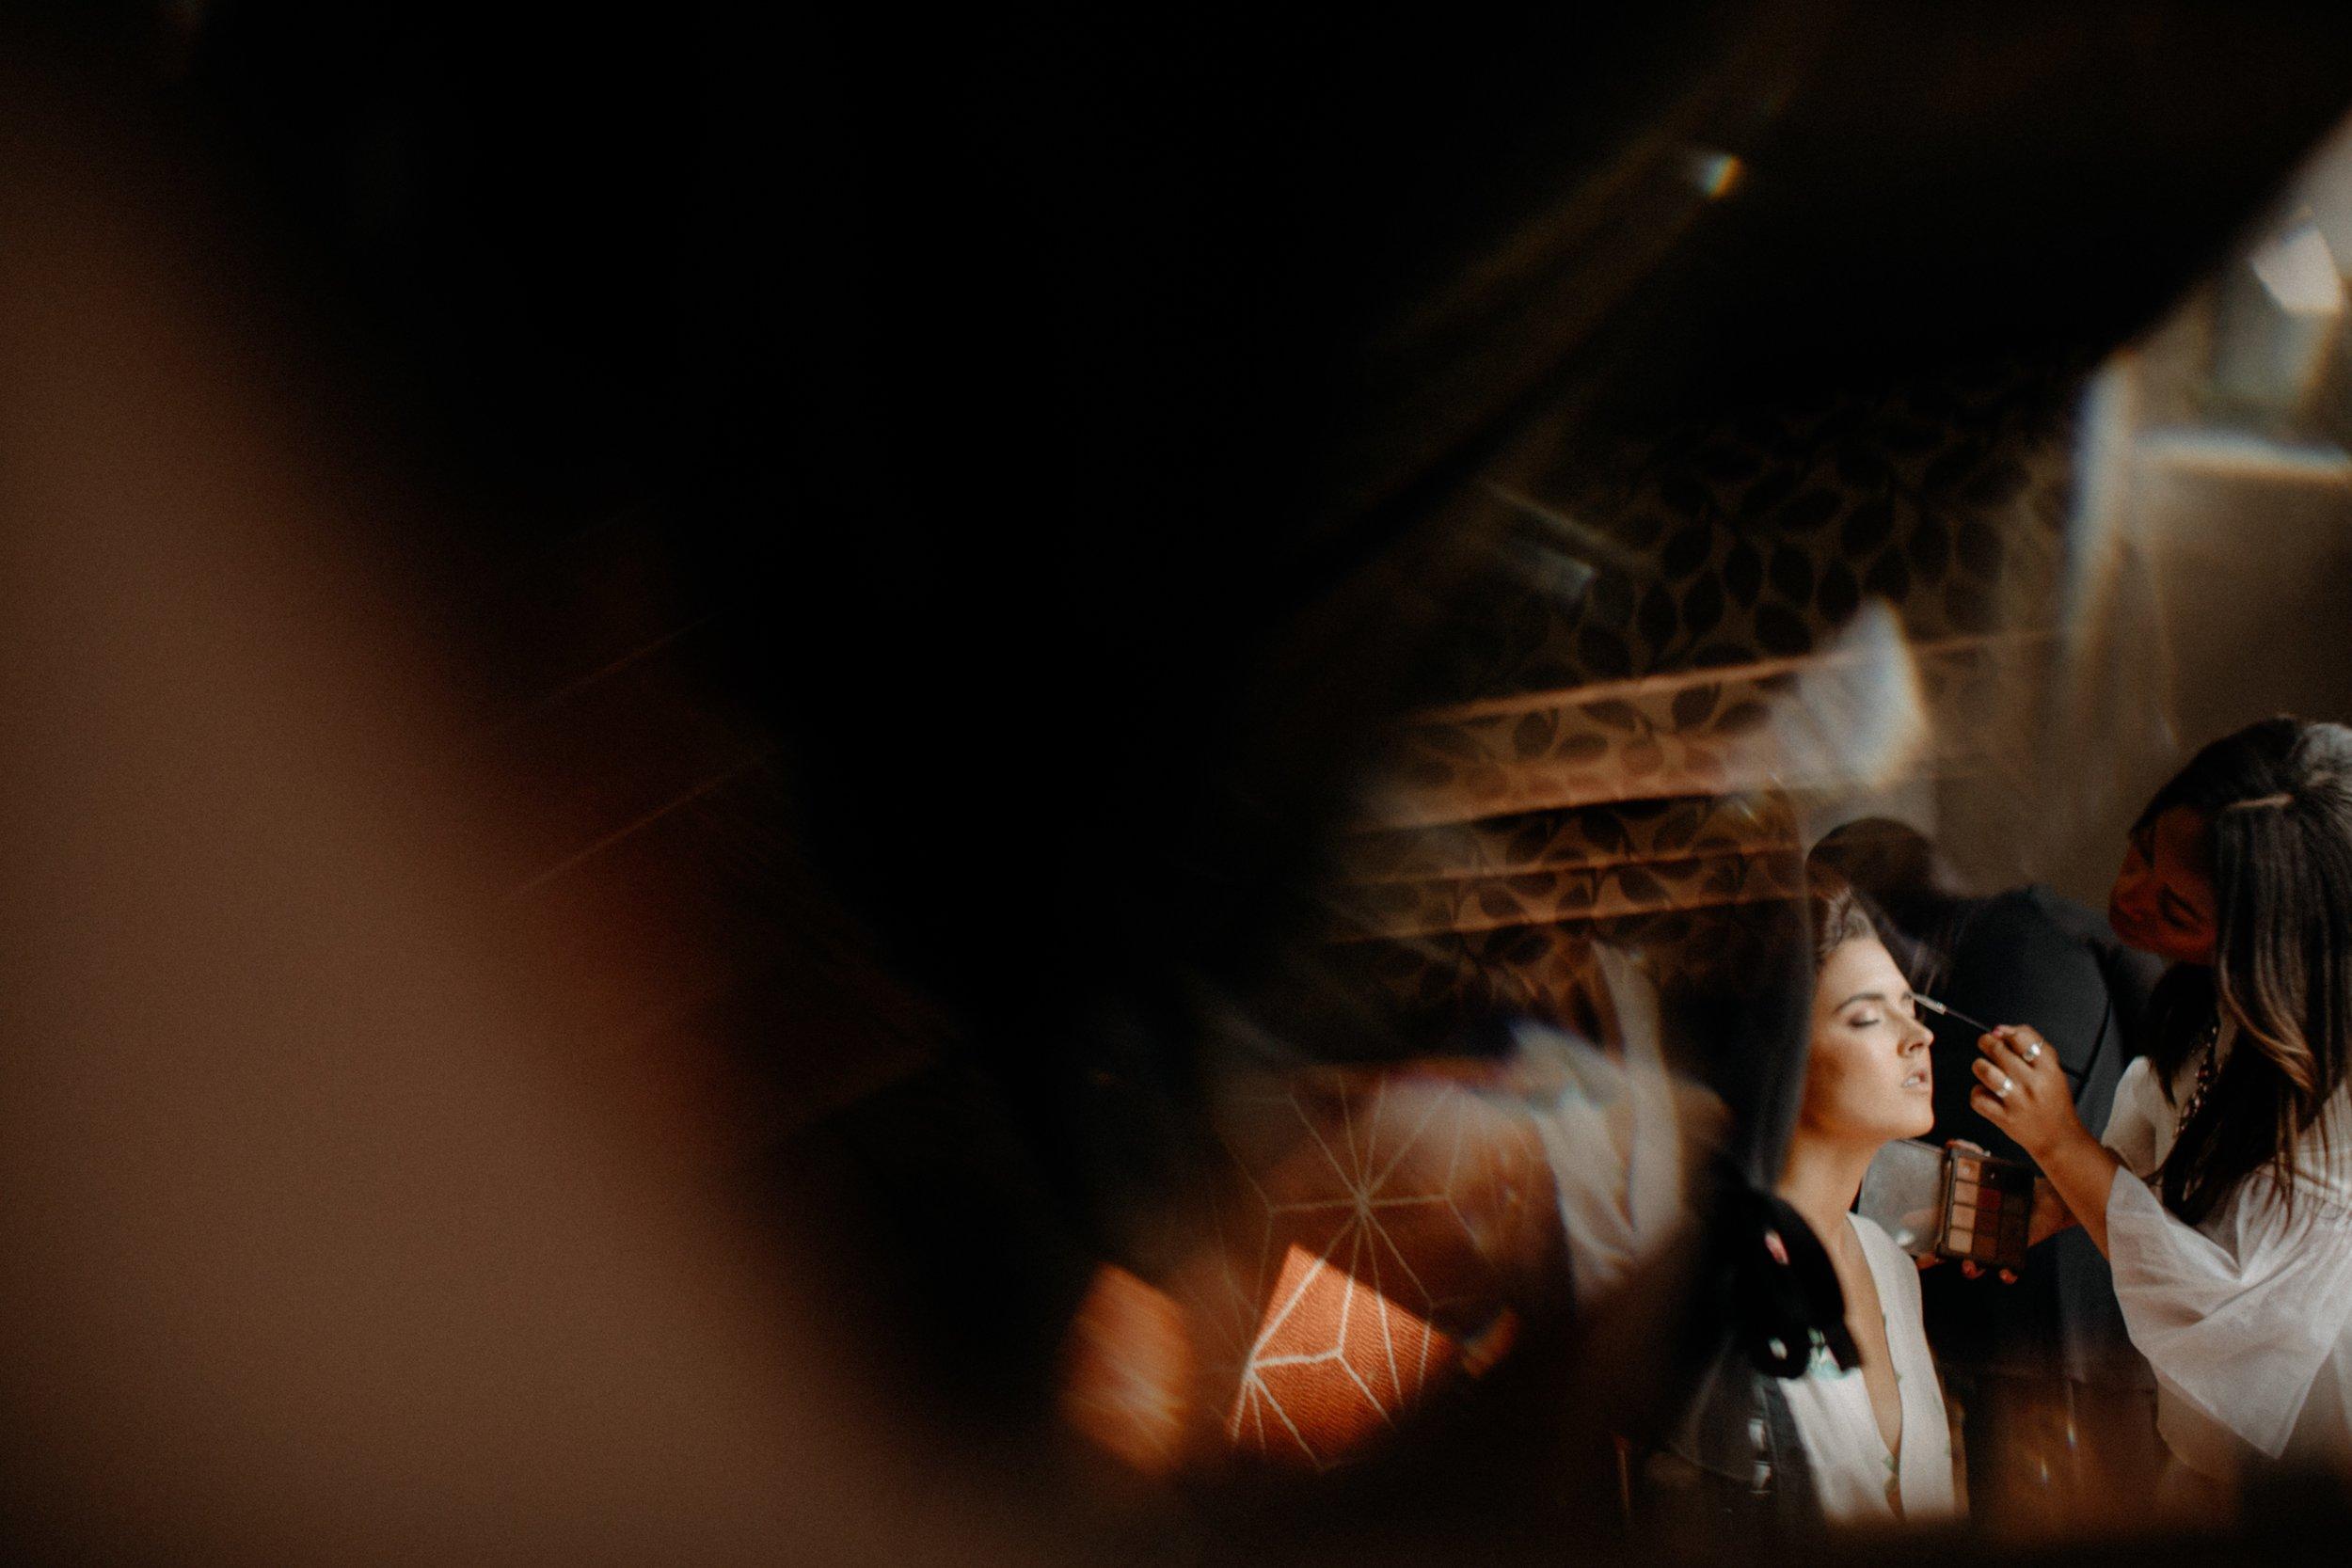 st-anthony-hotel-wedding-photography-10003san-antonio.JPG